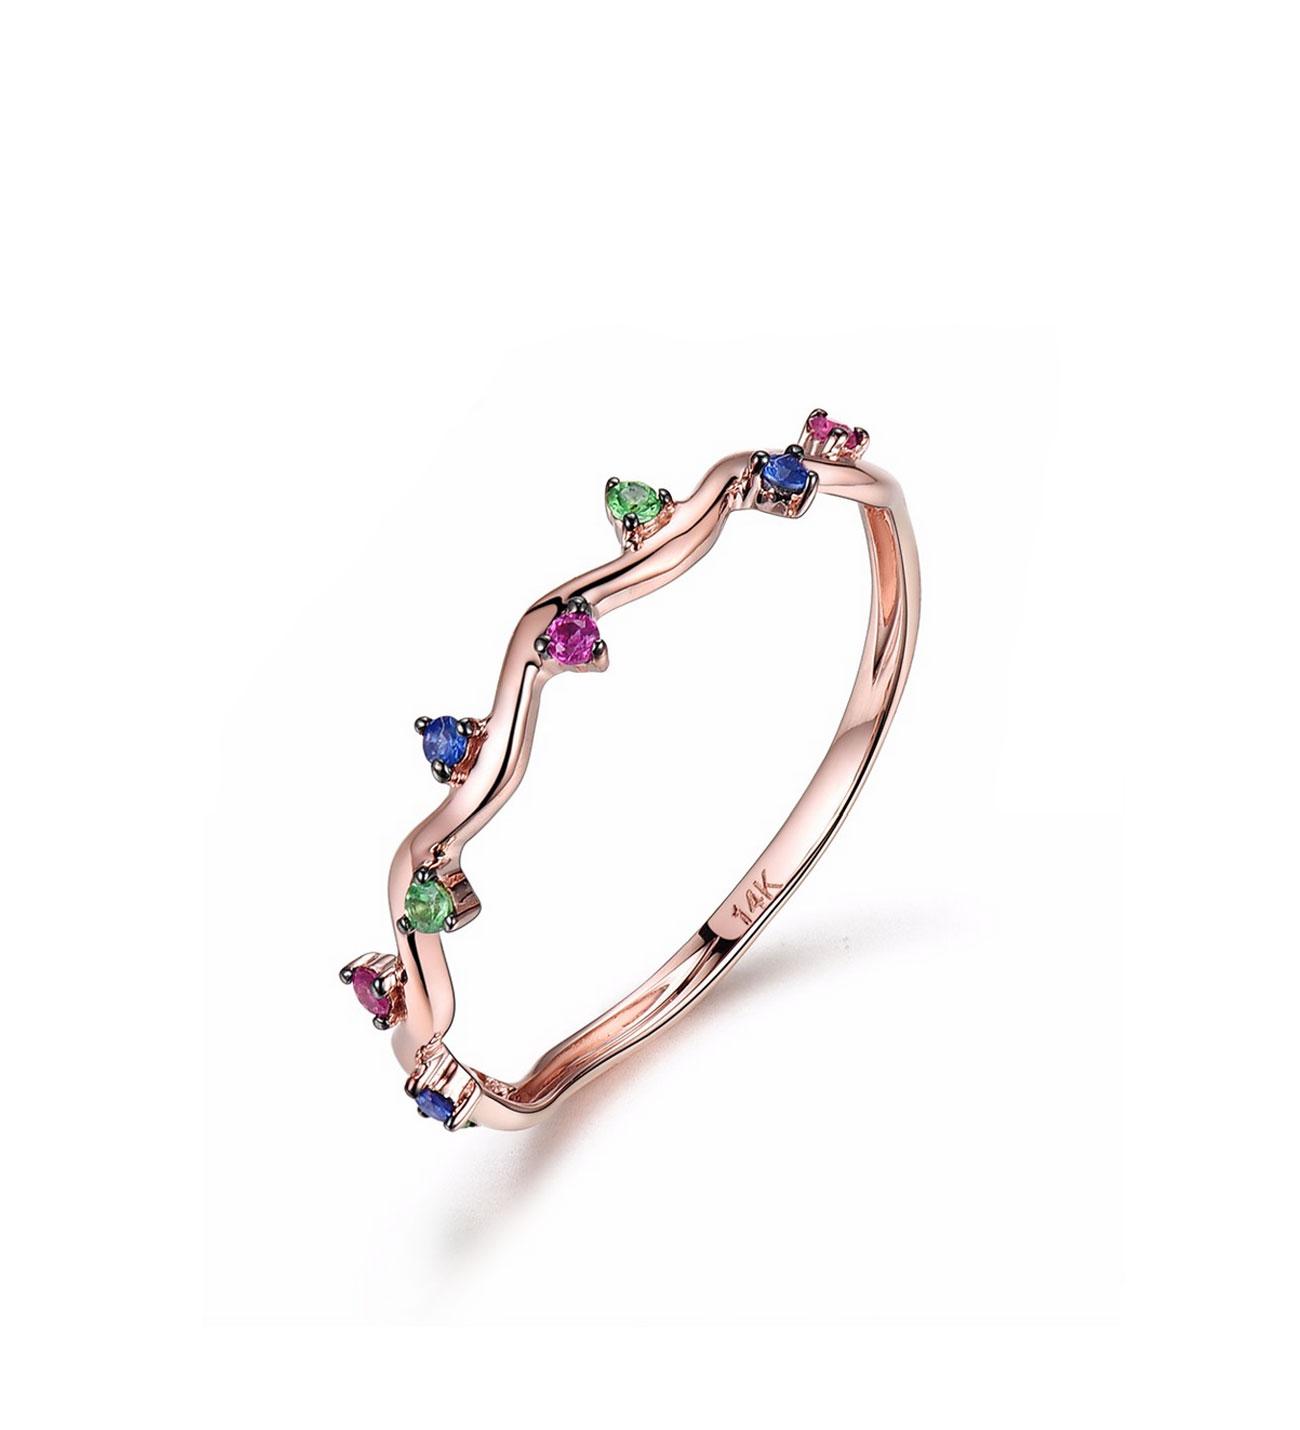 Sapphire & Emerald & Ruby Gemmed Gold Ring